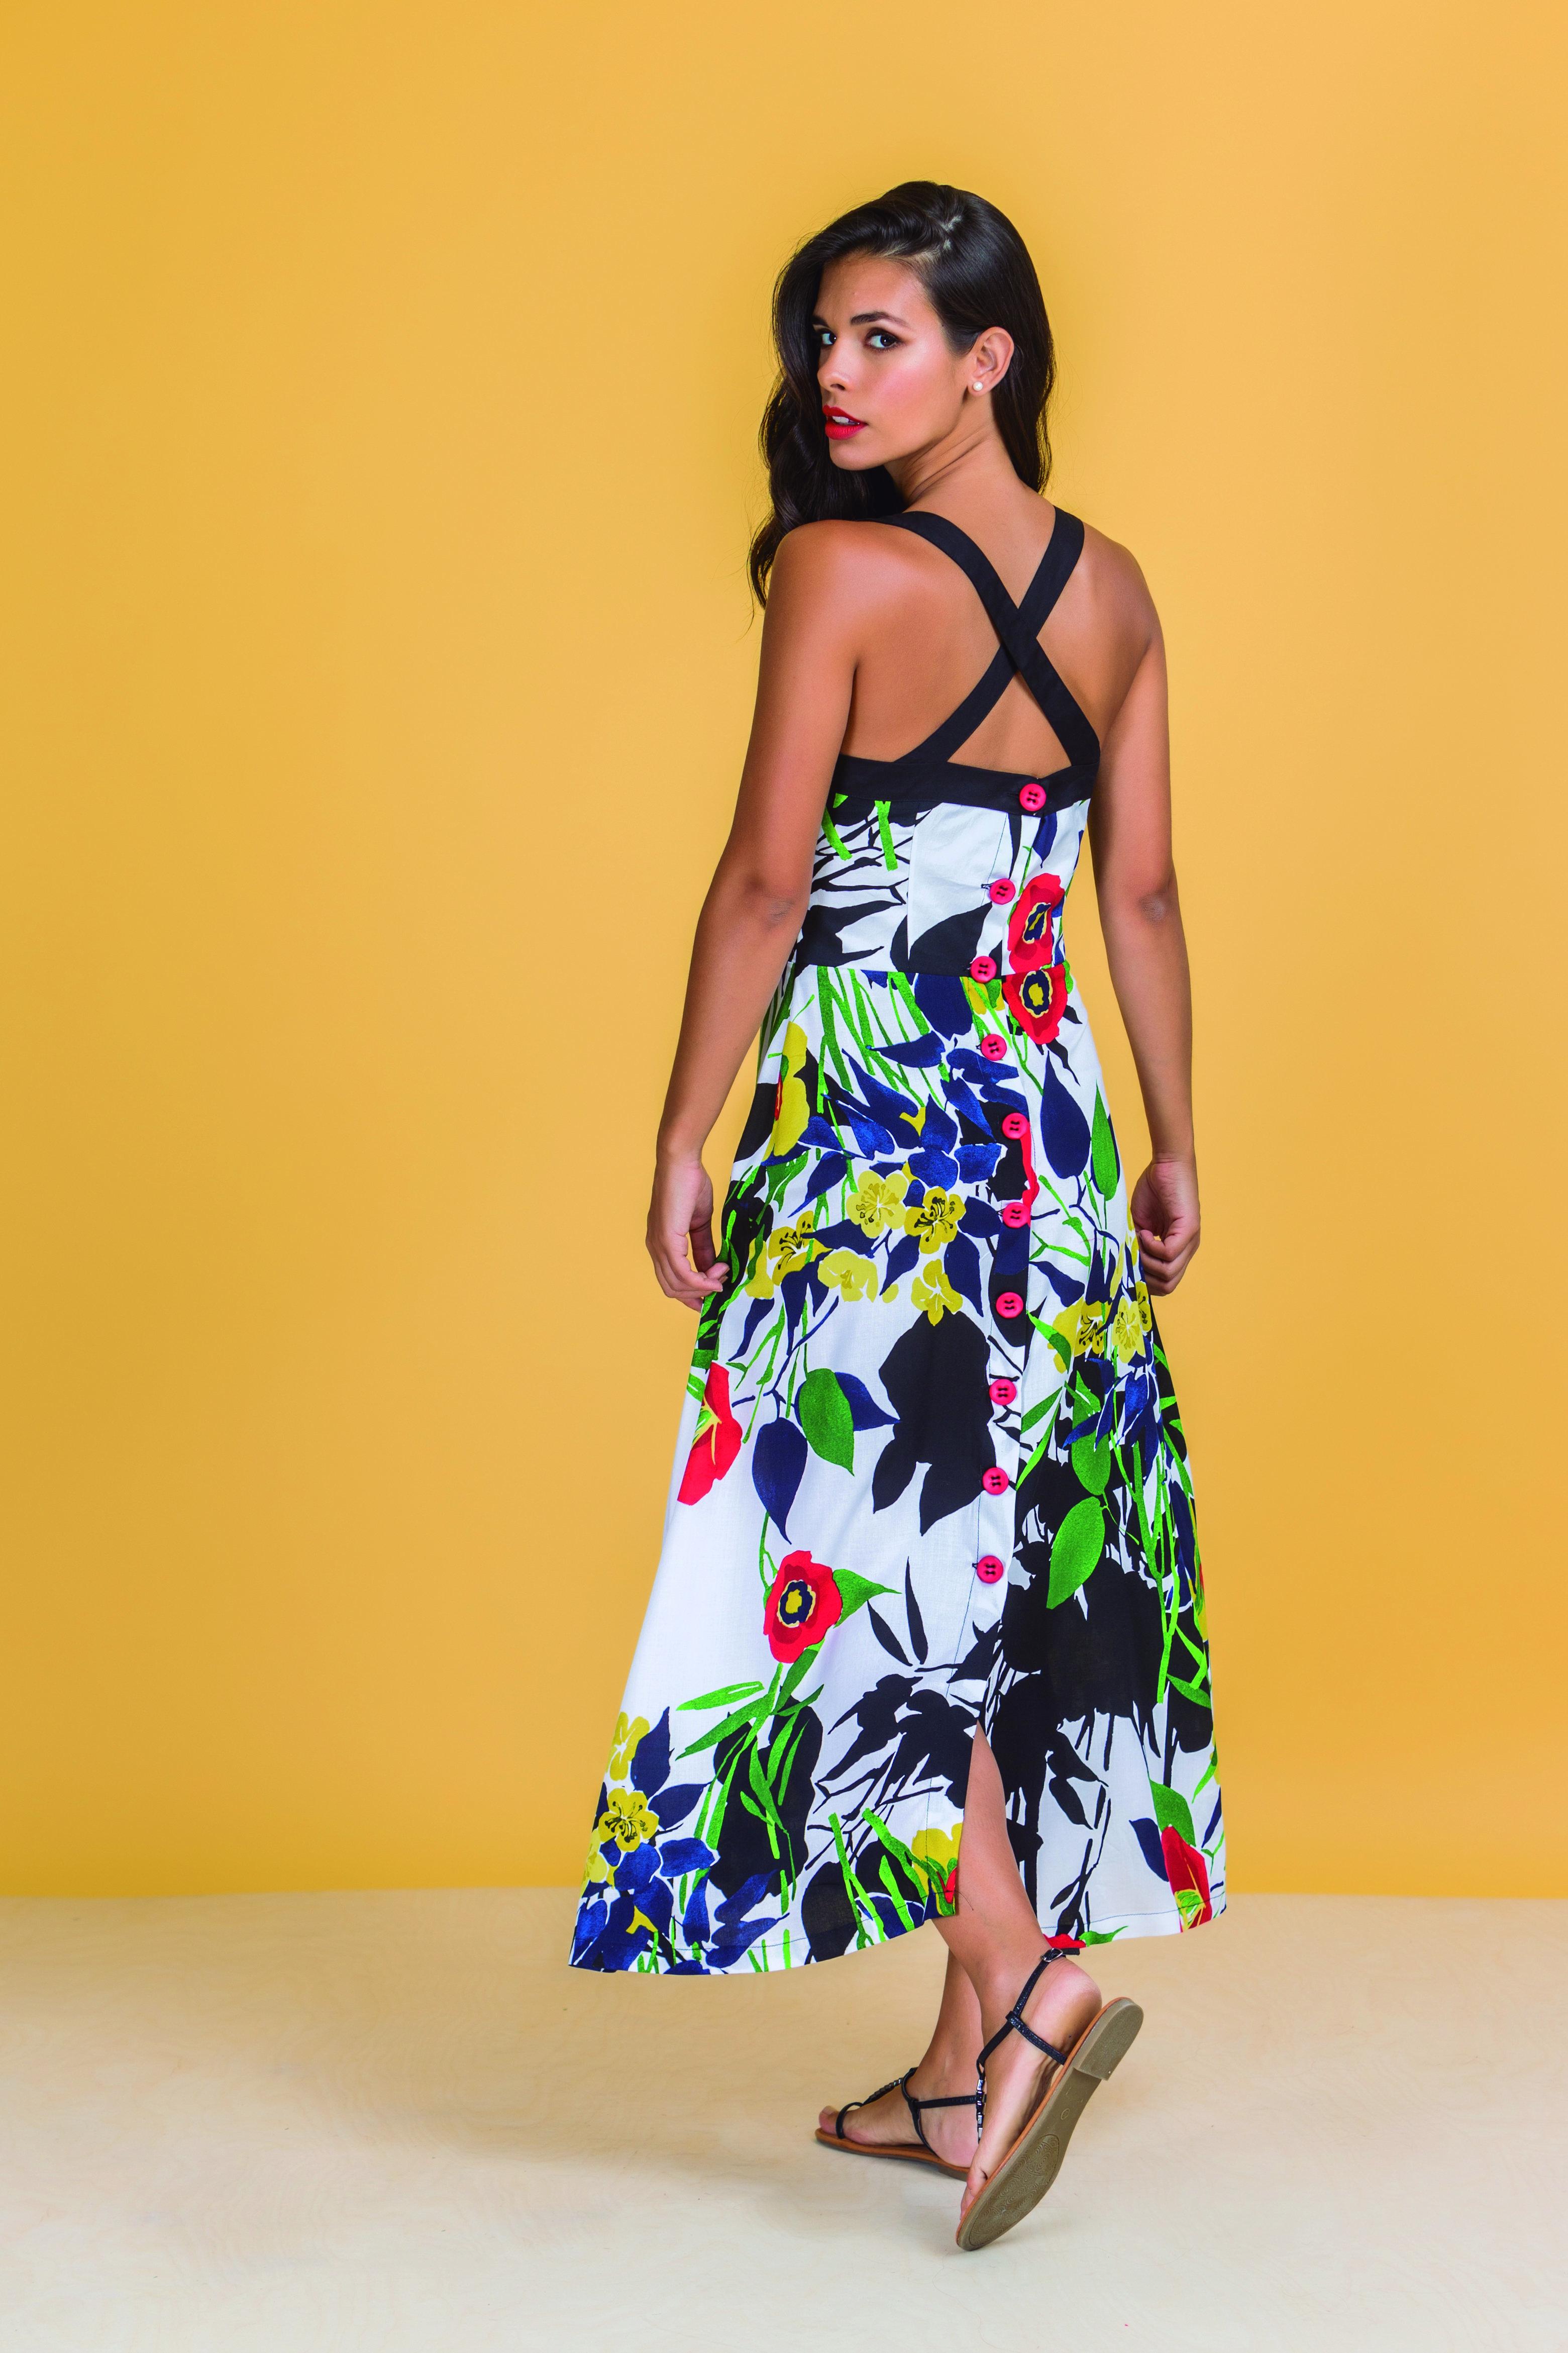 Paul Brial: Backwards Garden Maxi Dress (2 Left!) PB_EDEN_N5